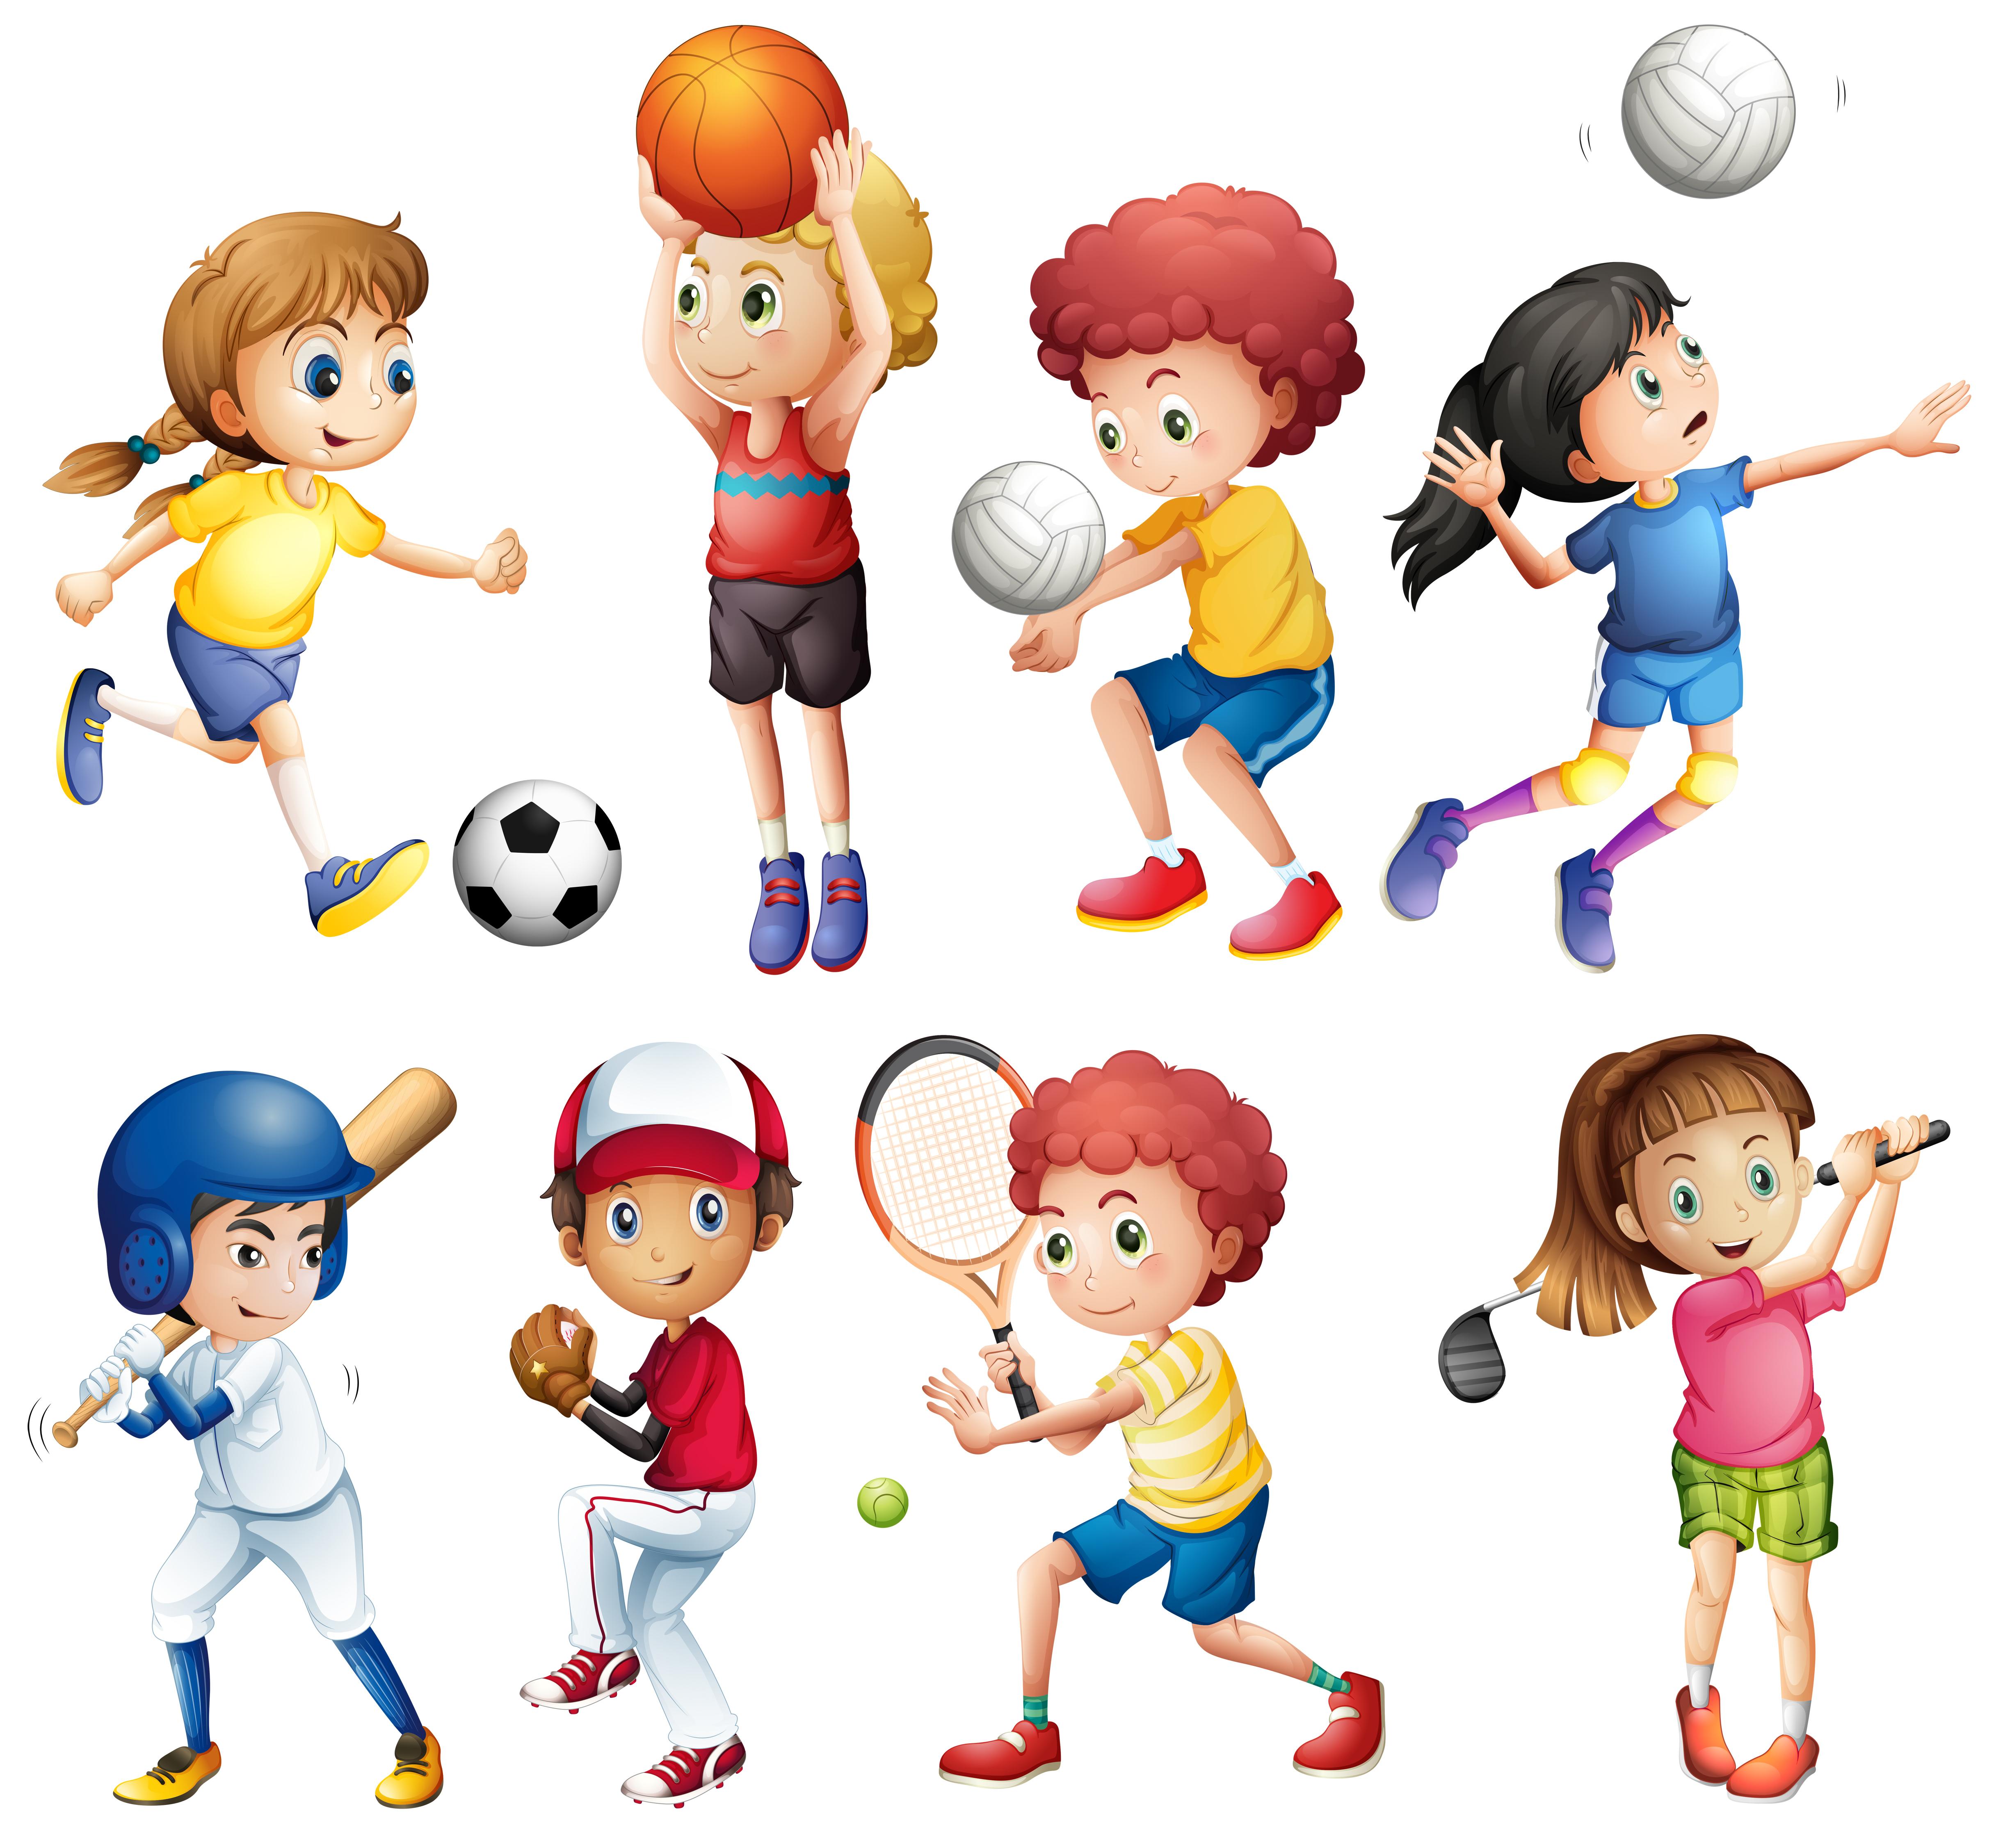 Children And Sports 414730 Vector Art At Vecteezy